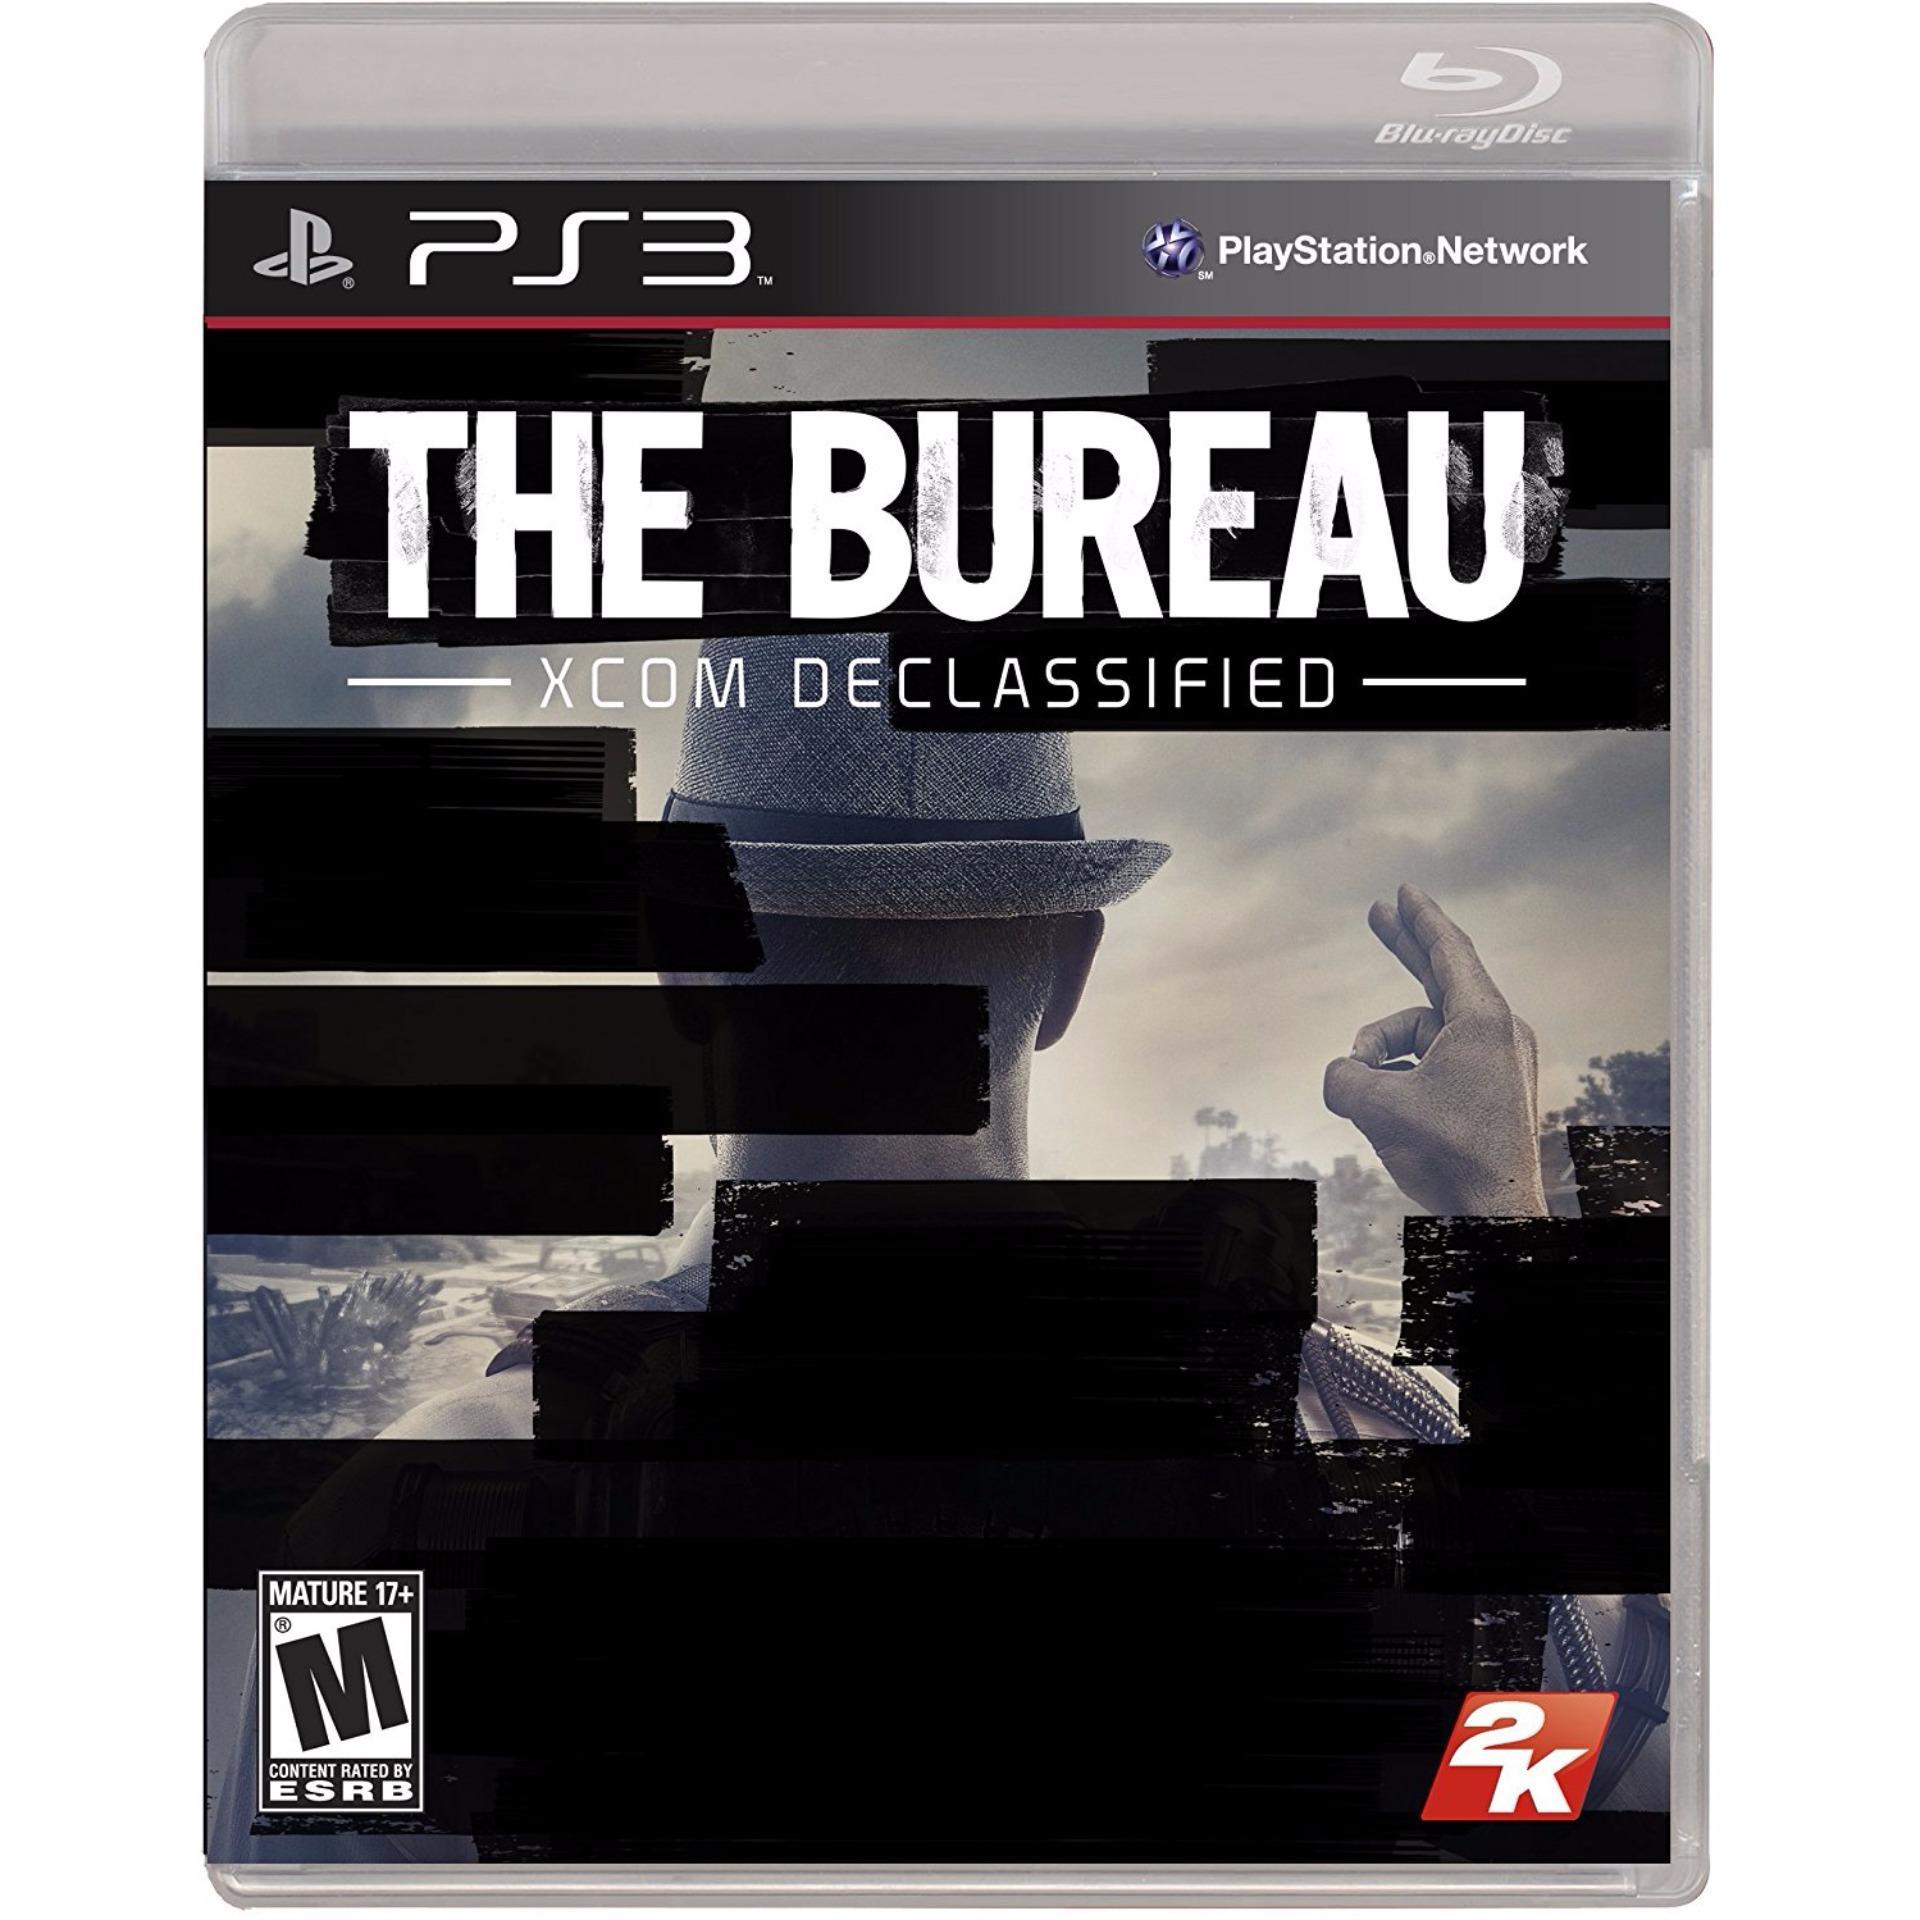 PS3 The Bureau Xcom Declassified (R3)